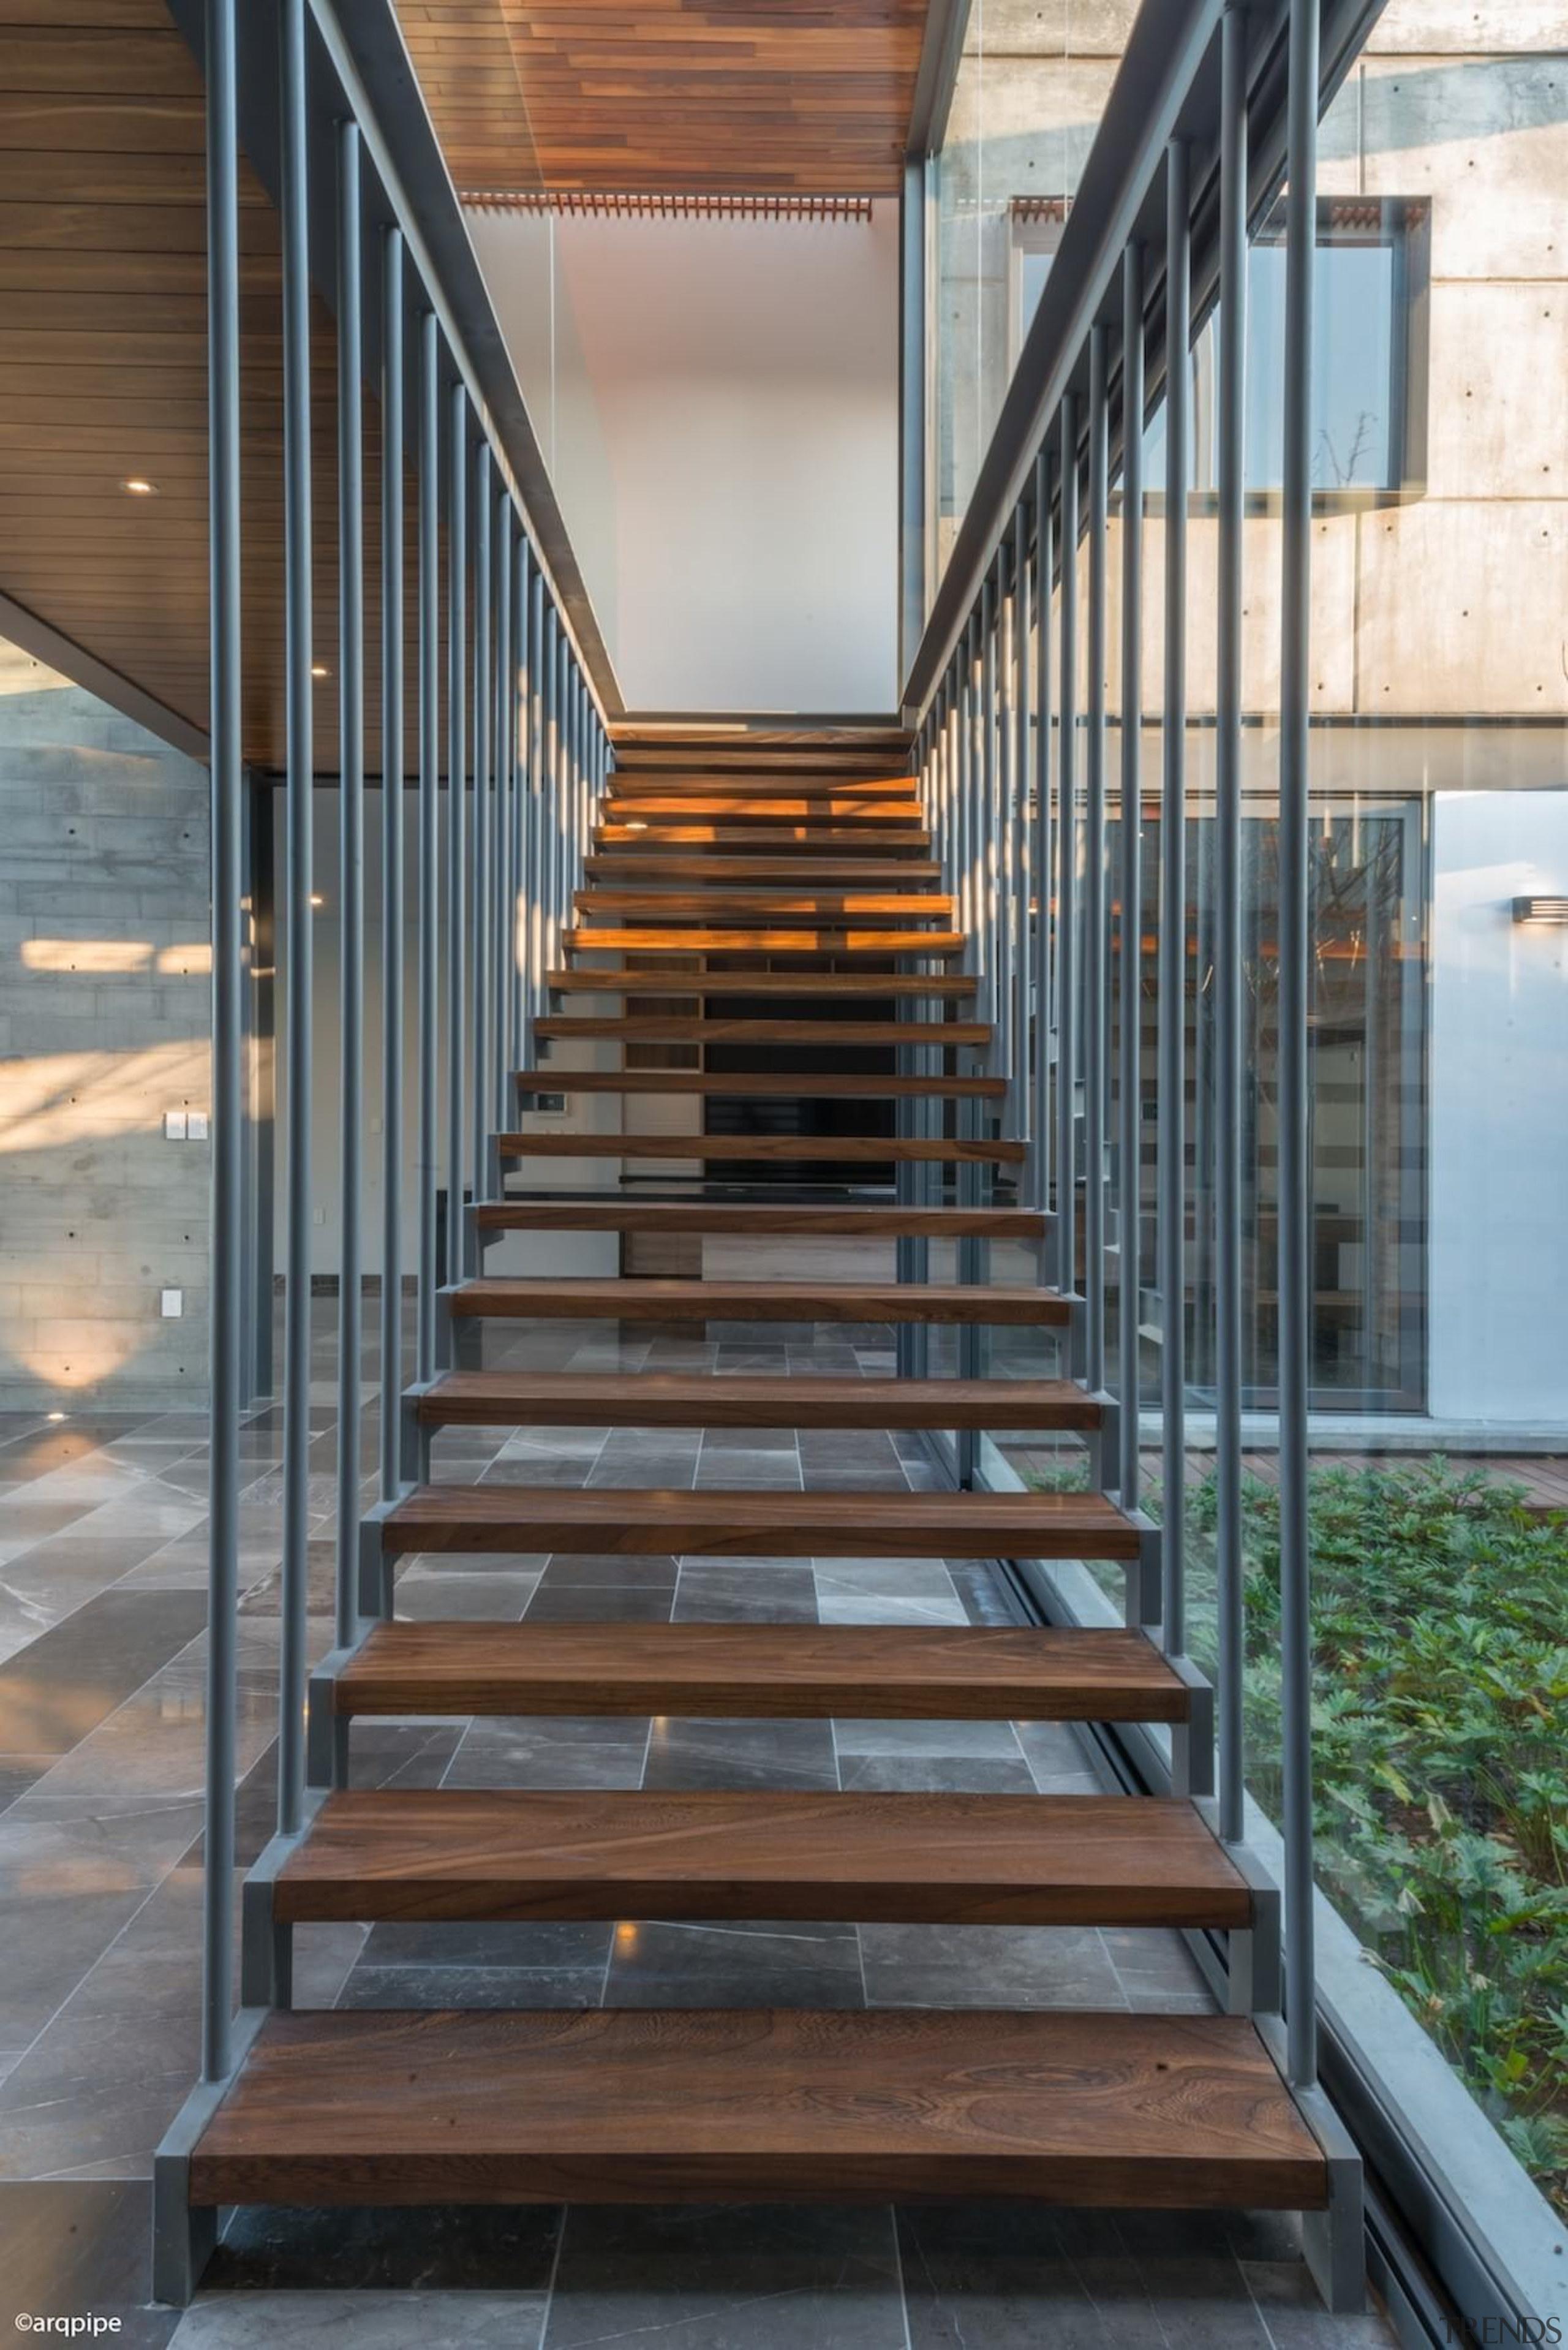 Colima home/Di Frenna Arquitectos - Colima home/Di Frenna architecture, daylighting, handrail, stairs, gray, black